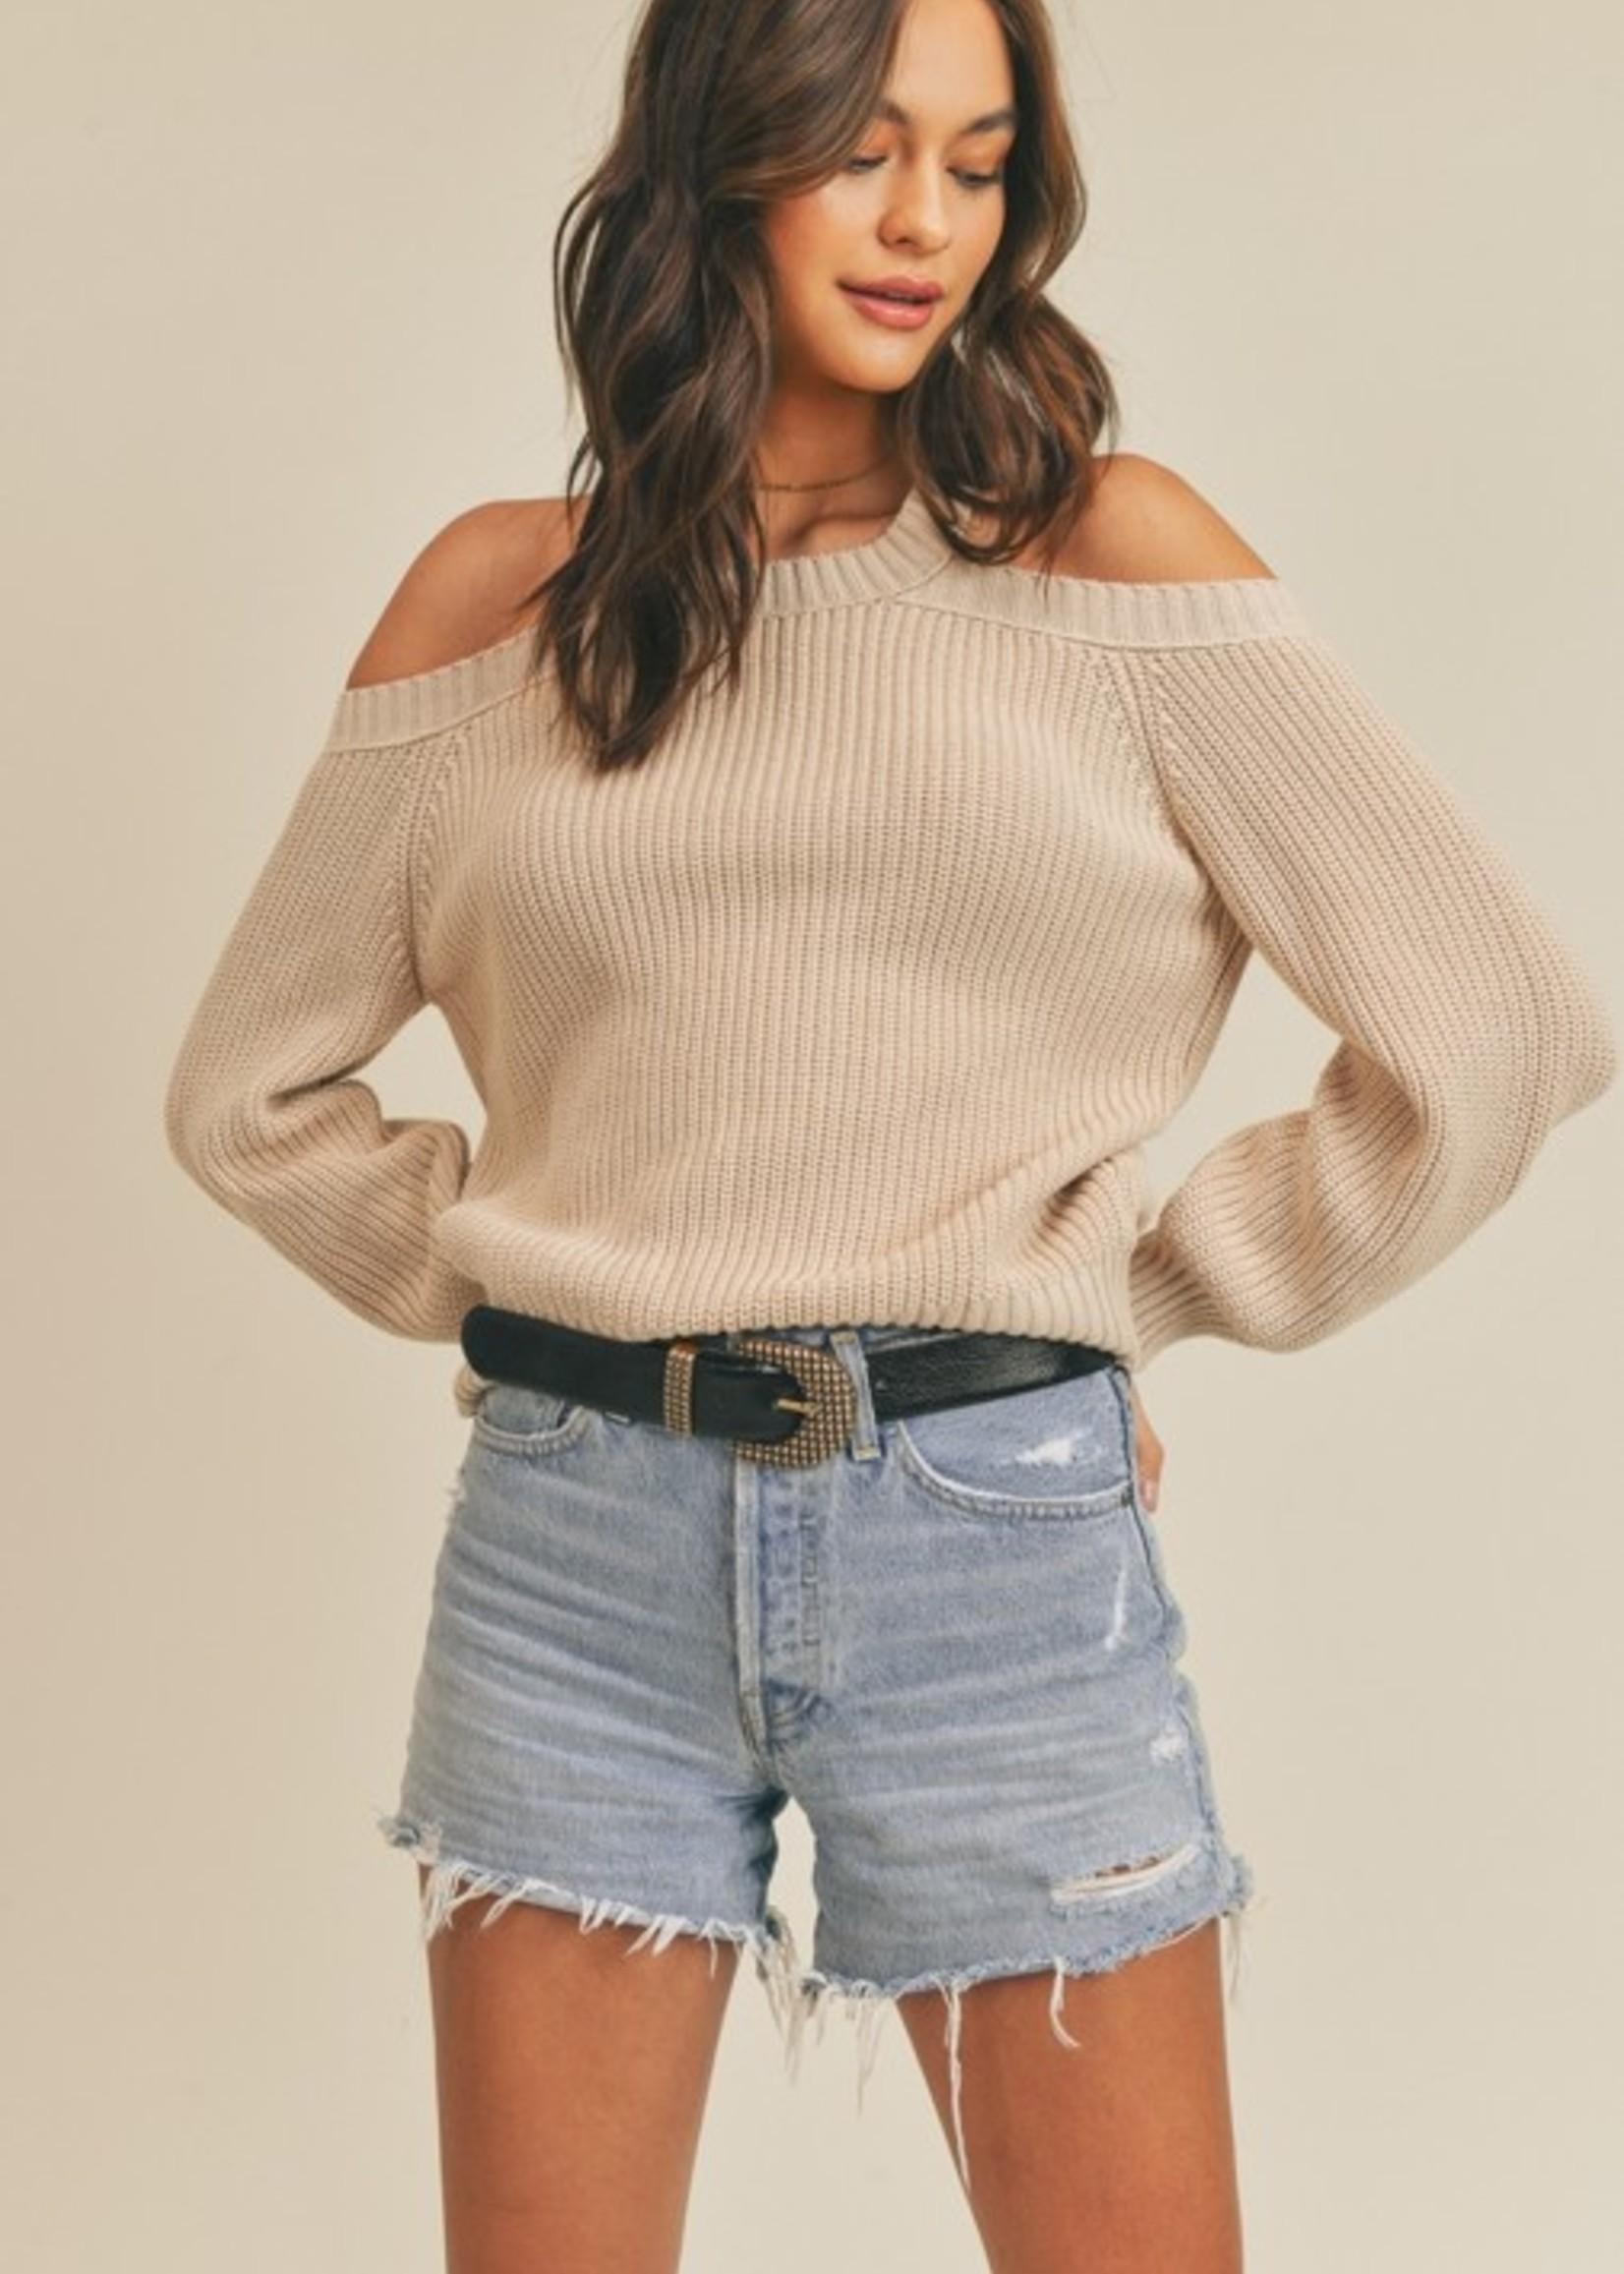 Lush Cutout Shoulder Sweater - Oat